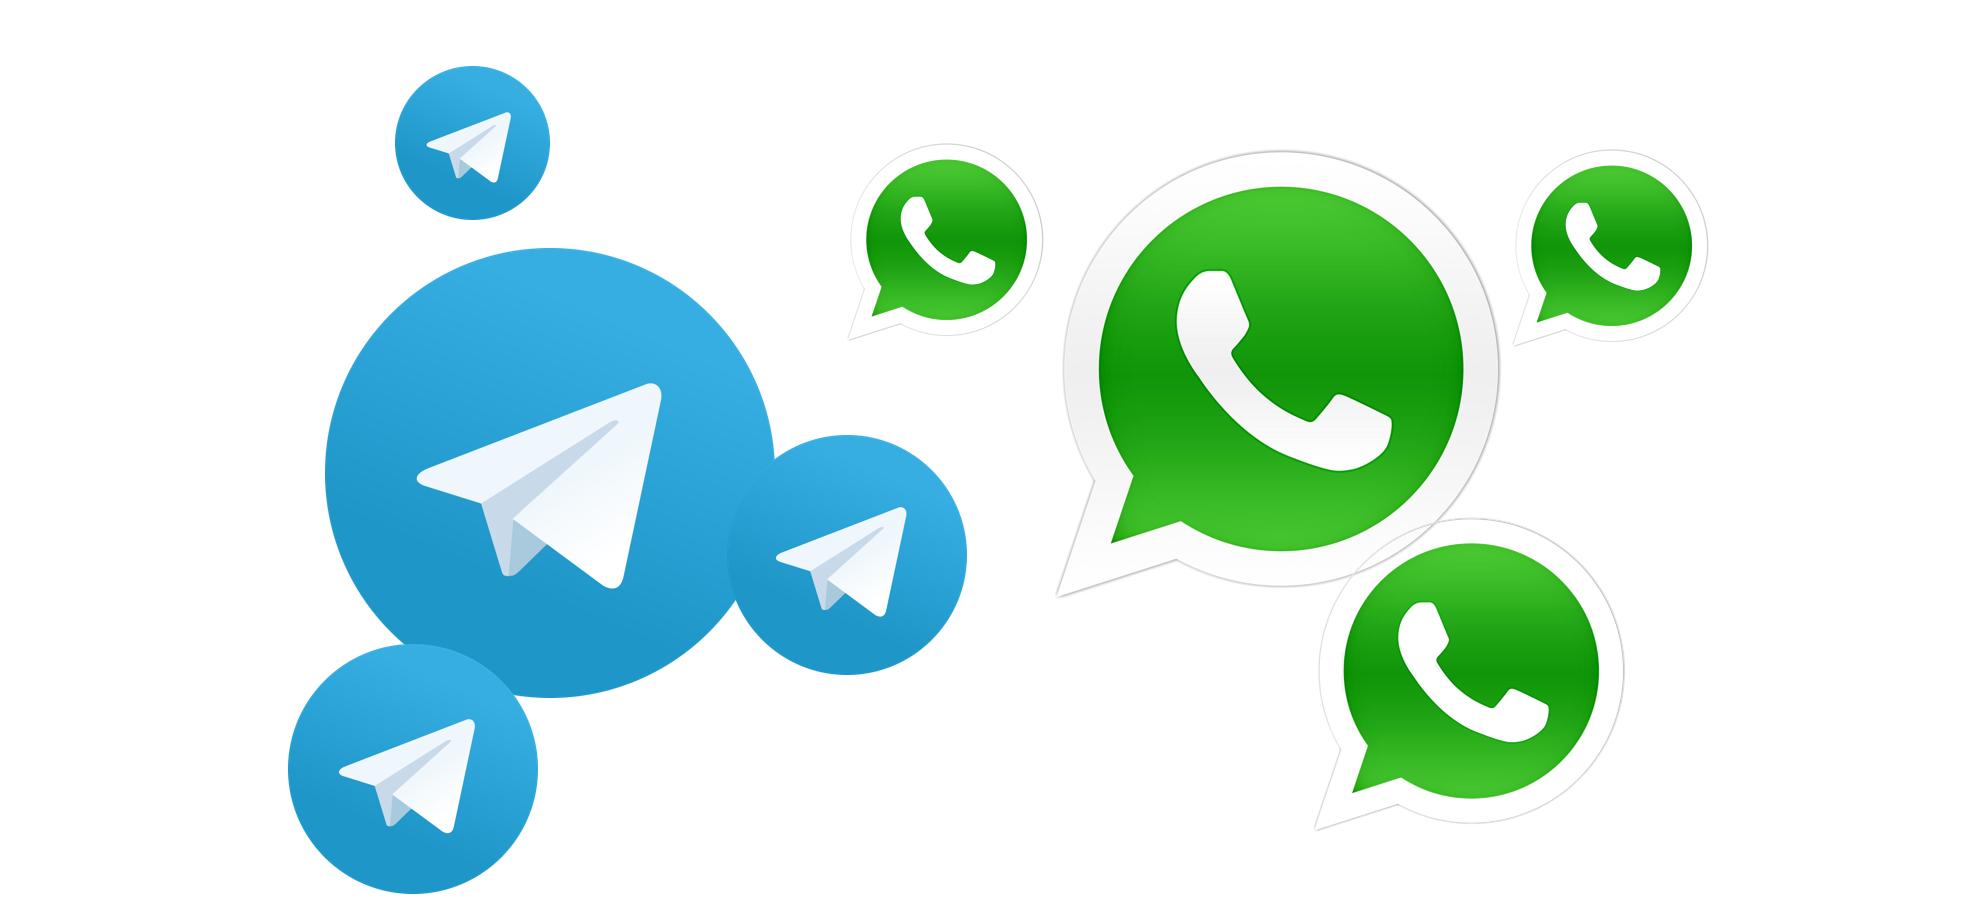 telegram WhatsApp - Telegram επιτρέπει την εισαγωγή συνομιλιών από WhatsApp